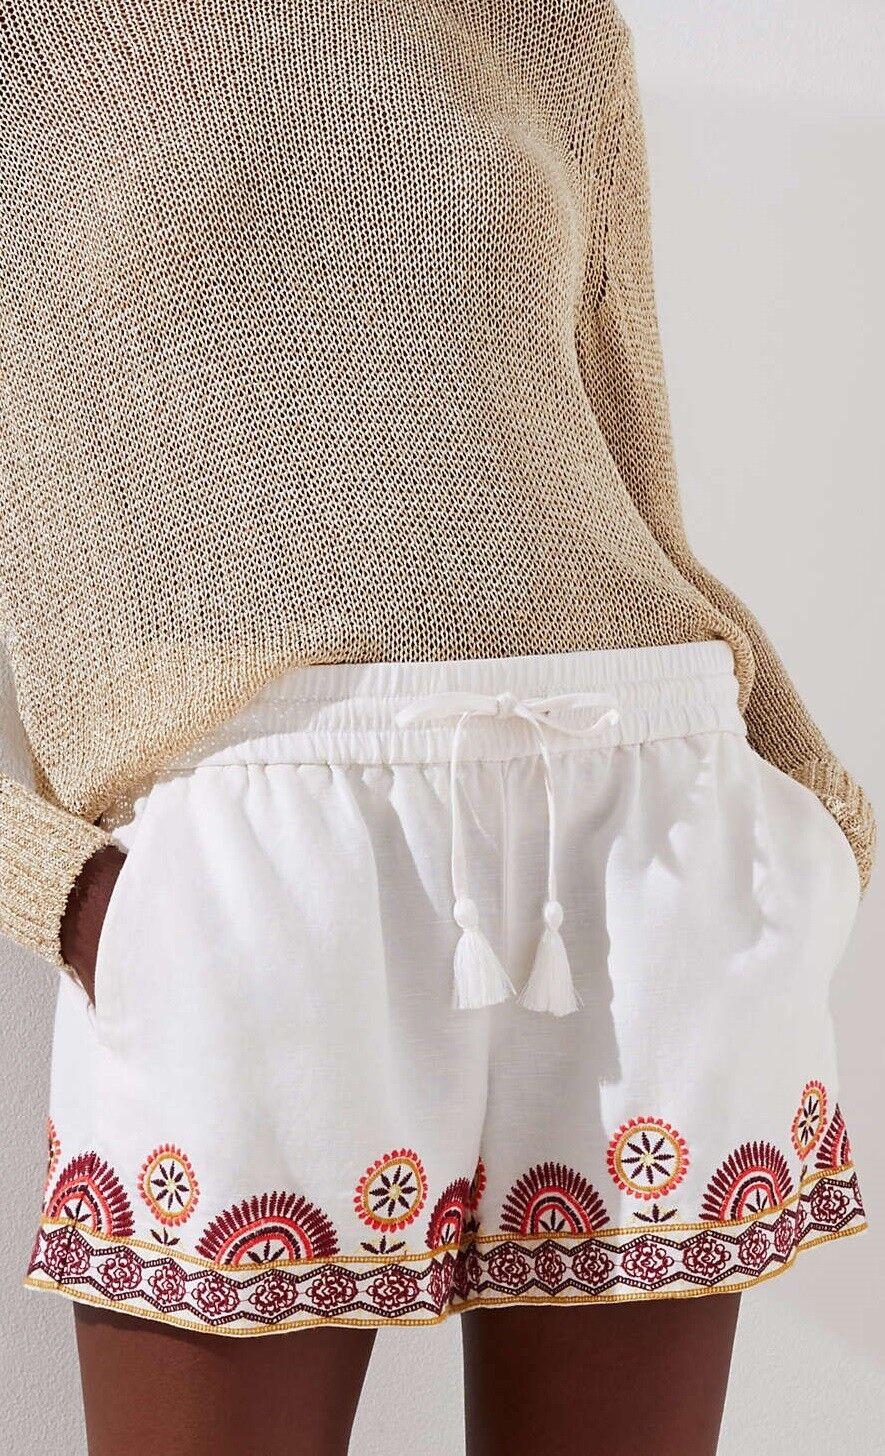 Ann Taylor LOFT Sunset Floral Drawstring Shorts Size Medium NWT Whisper White